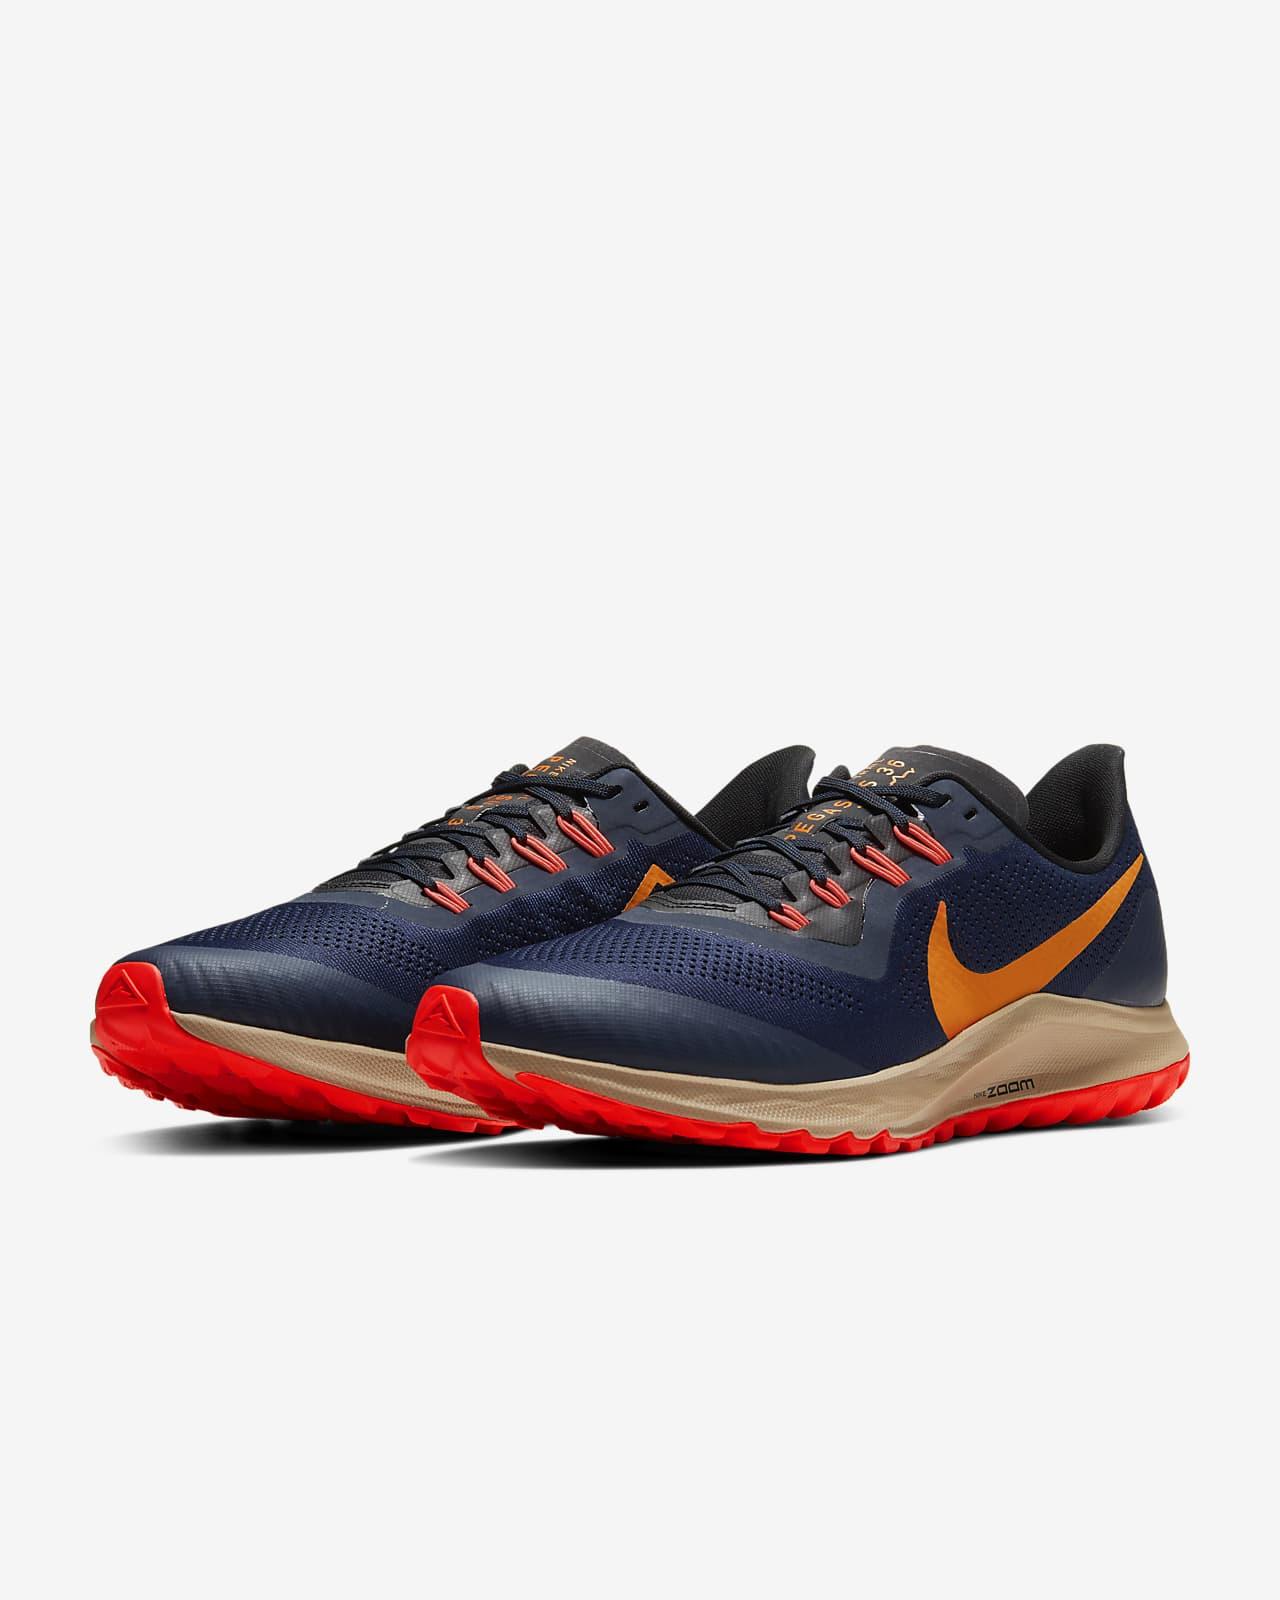 zorro grua Vandalir  Nike Air Zoom Pegasus 36 Trail Men's Trail Running Shoe. Nike IN